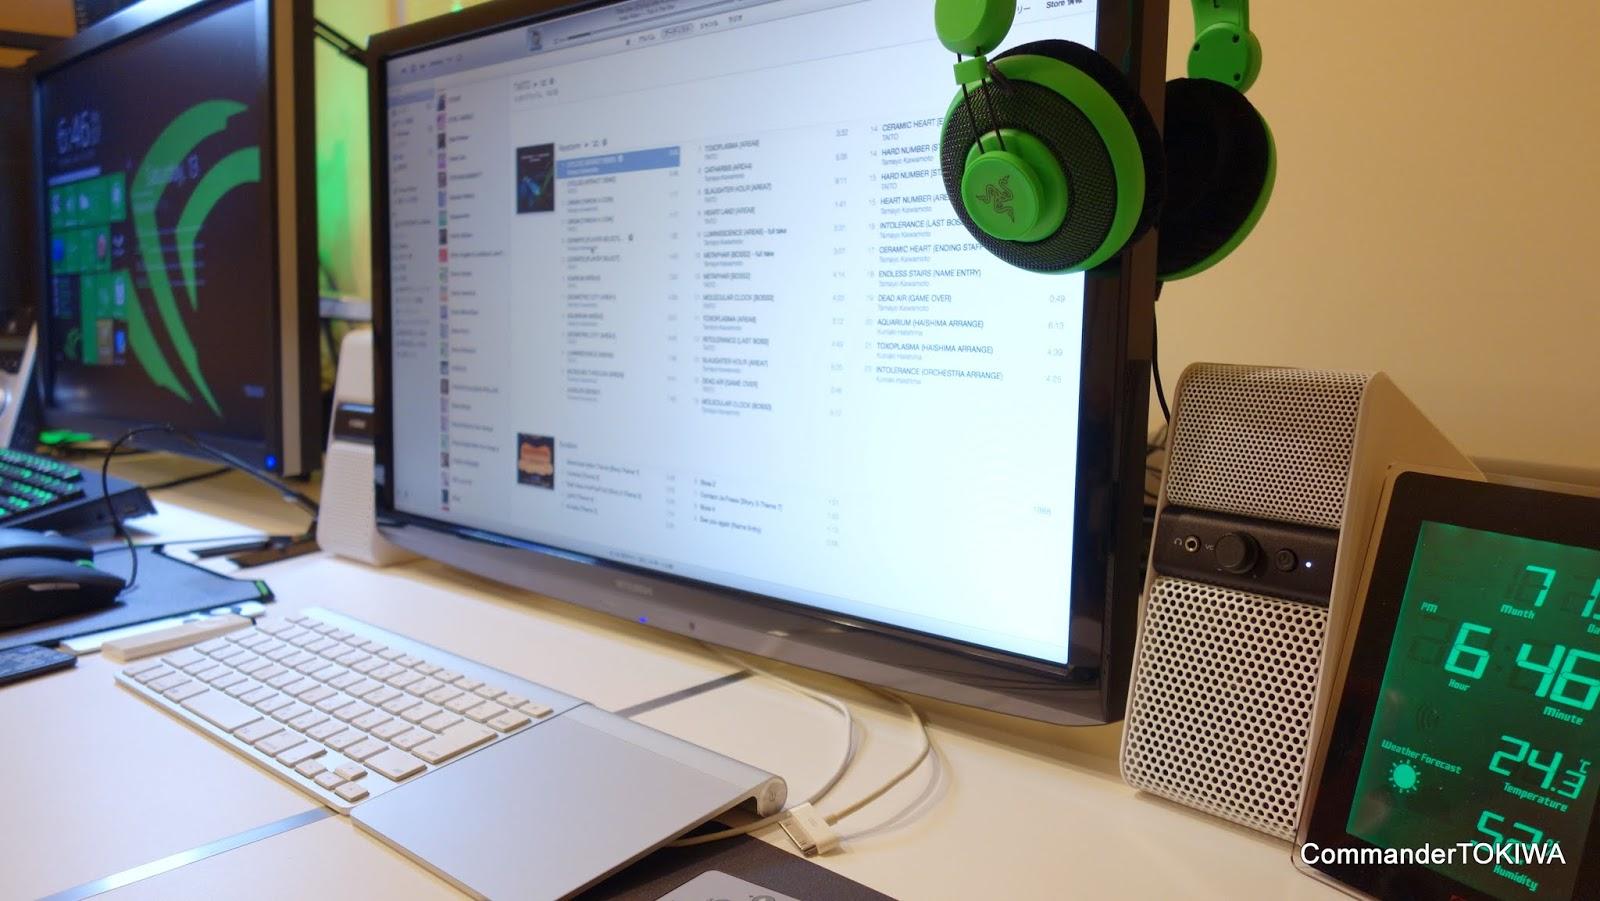 yamaha nx 50 powerd speaker. Black Bedroom Furniture Sets. Home Design Ideas